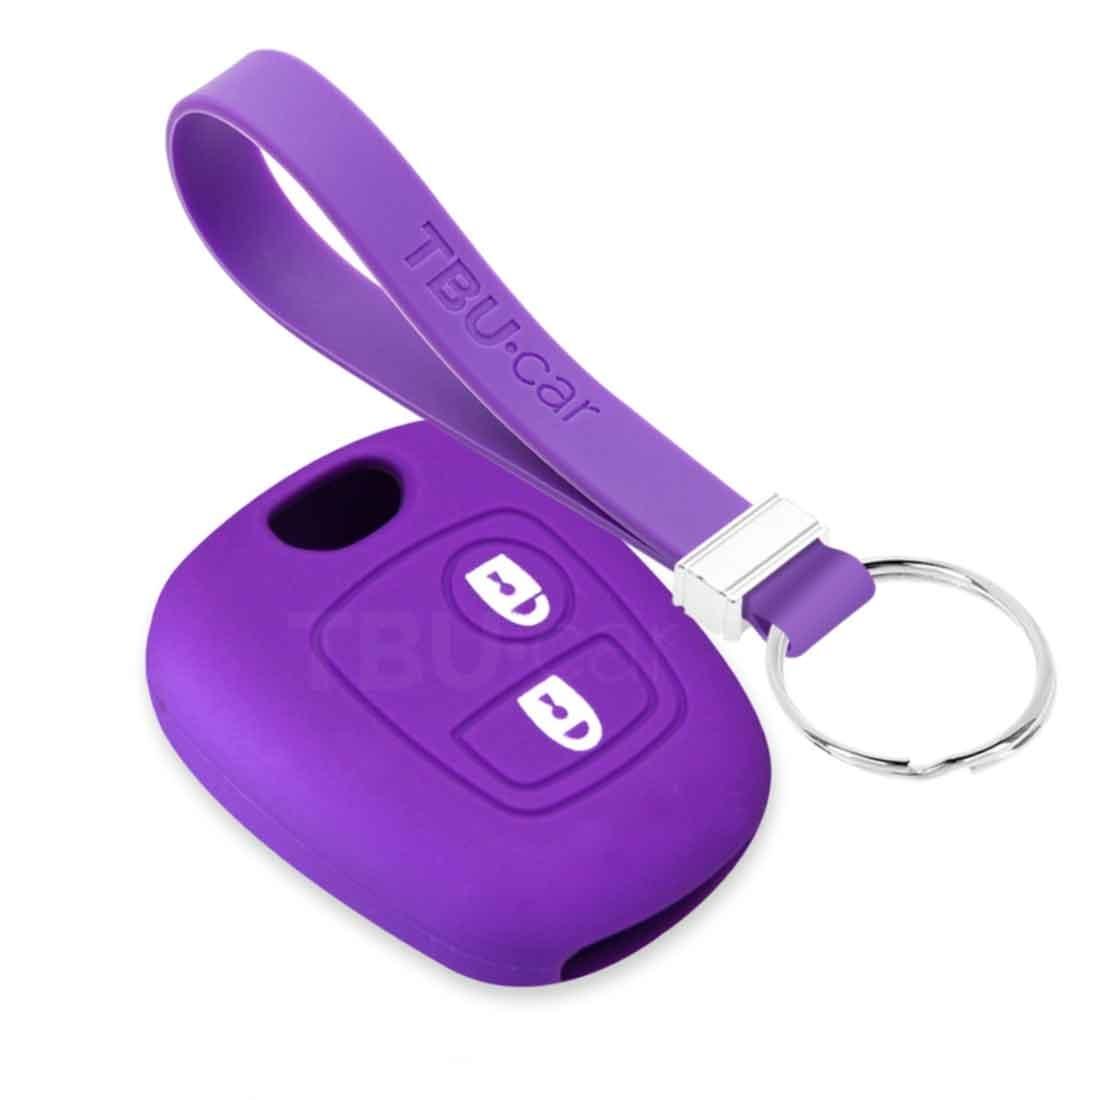 TBU car TBU car Car key cover compatible with Citroën - Silicone Protective Remote Key Shell - FOB Case Cover - Purple